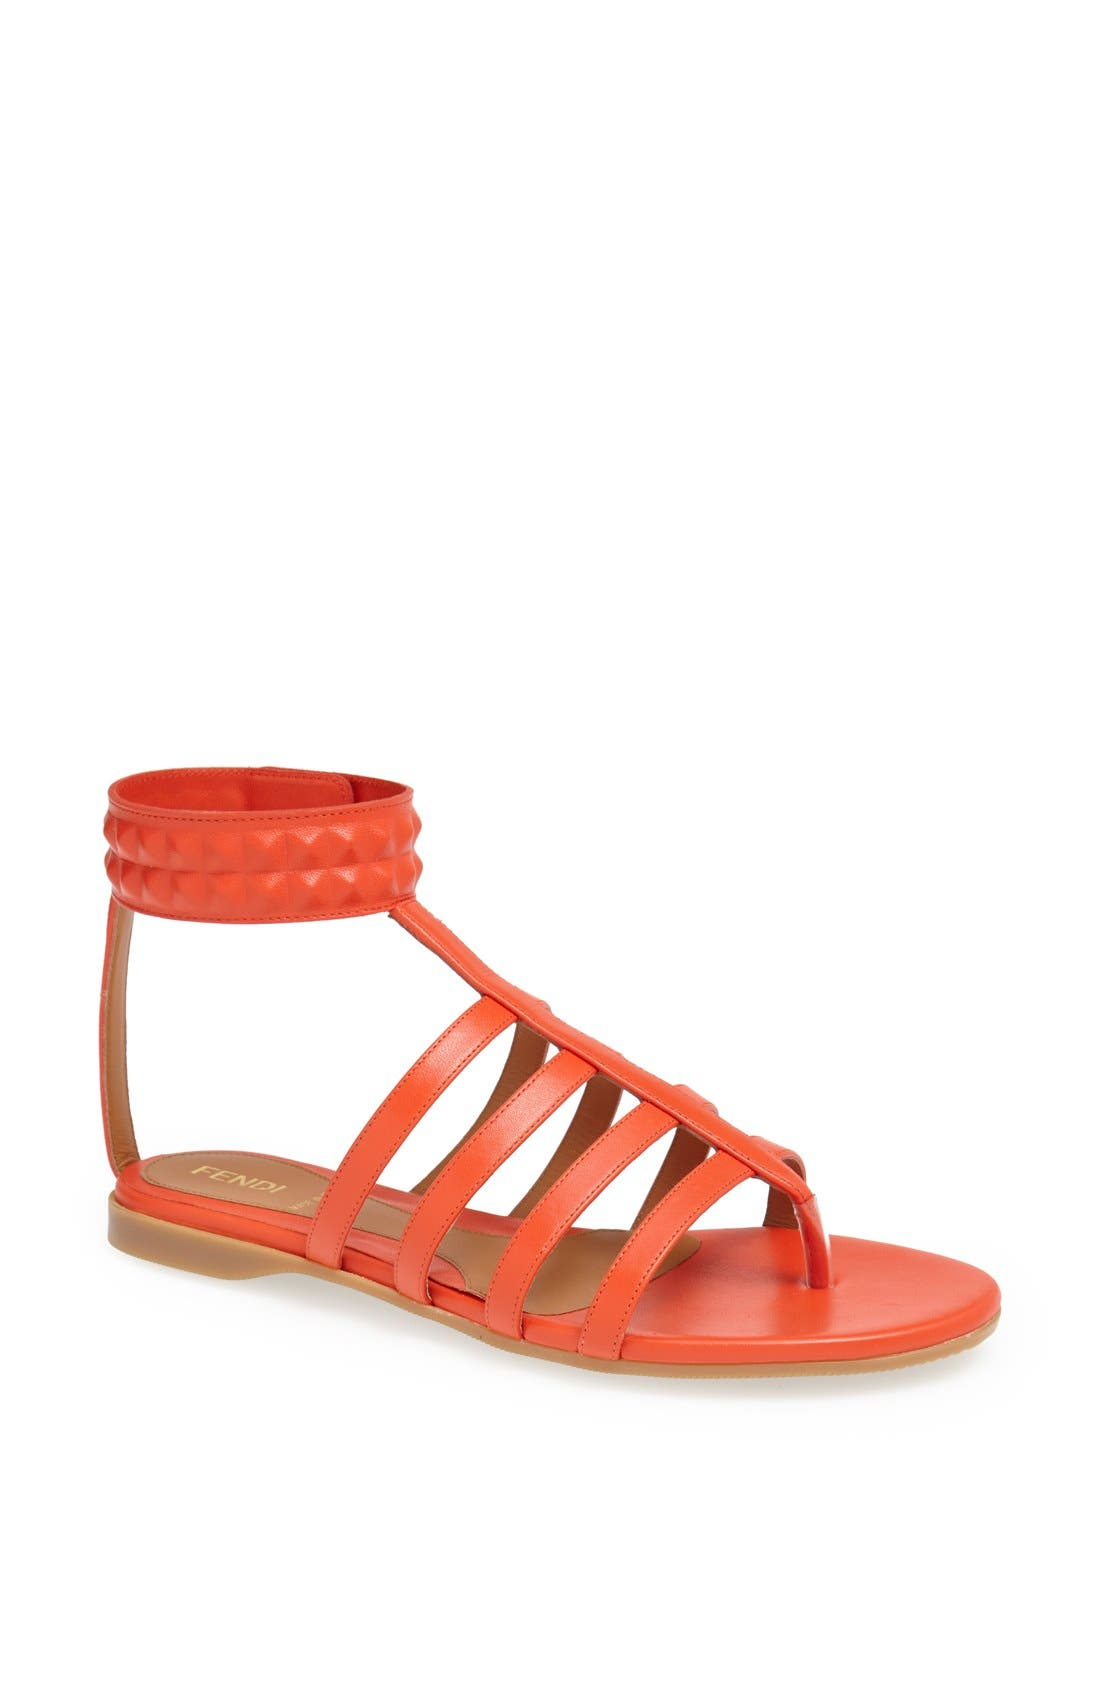 Alternate Image 1 Selected - Fendi 'Diana' Leather Sandal